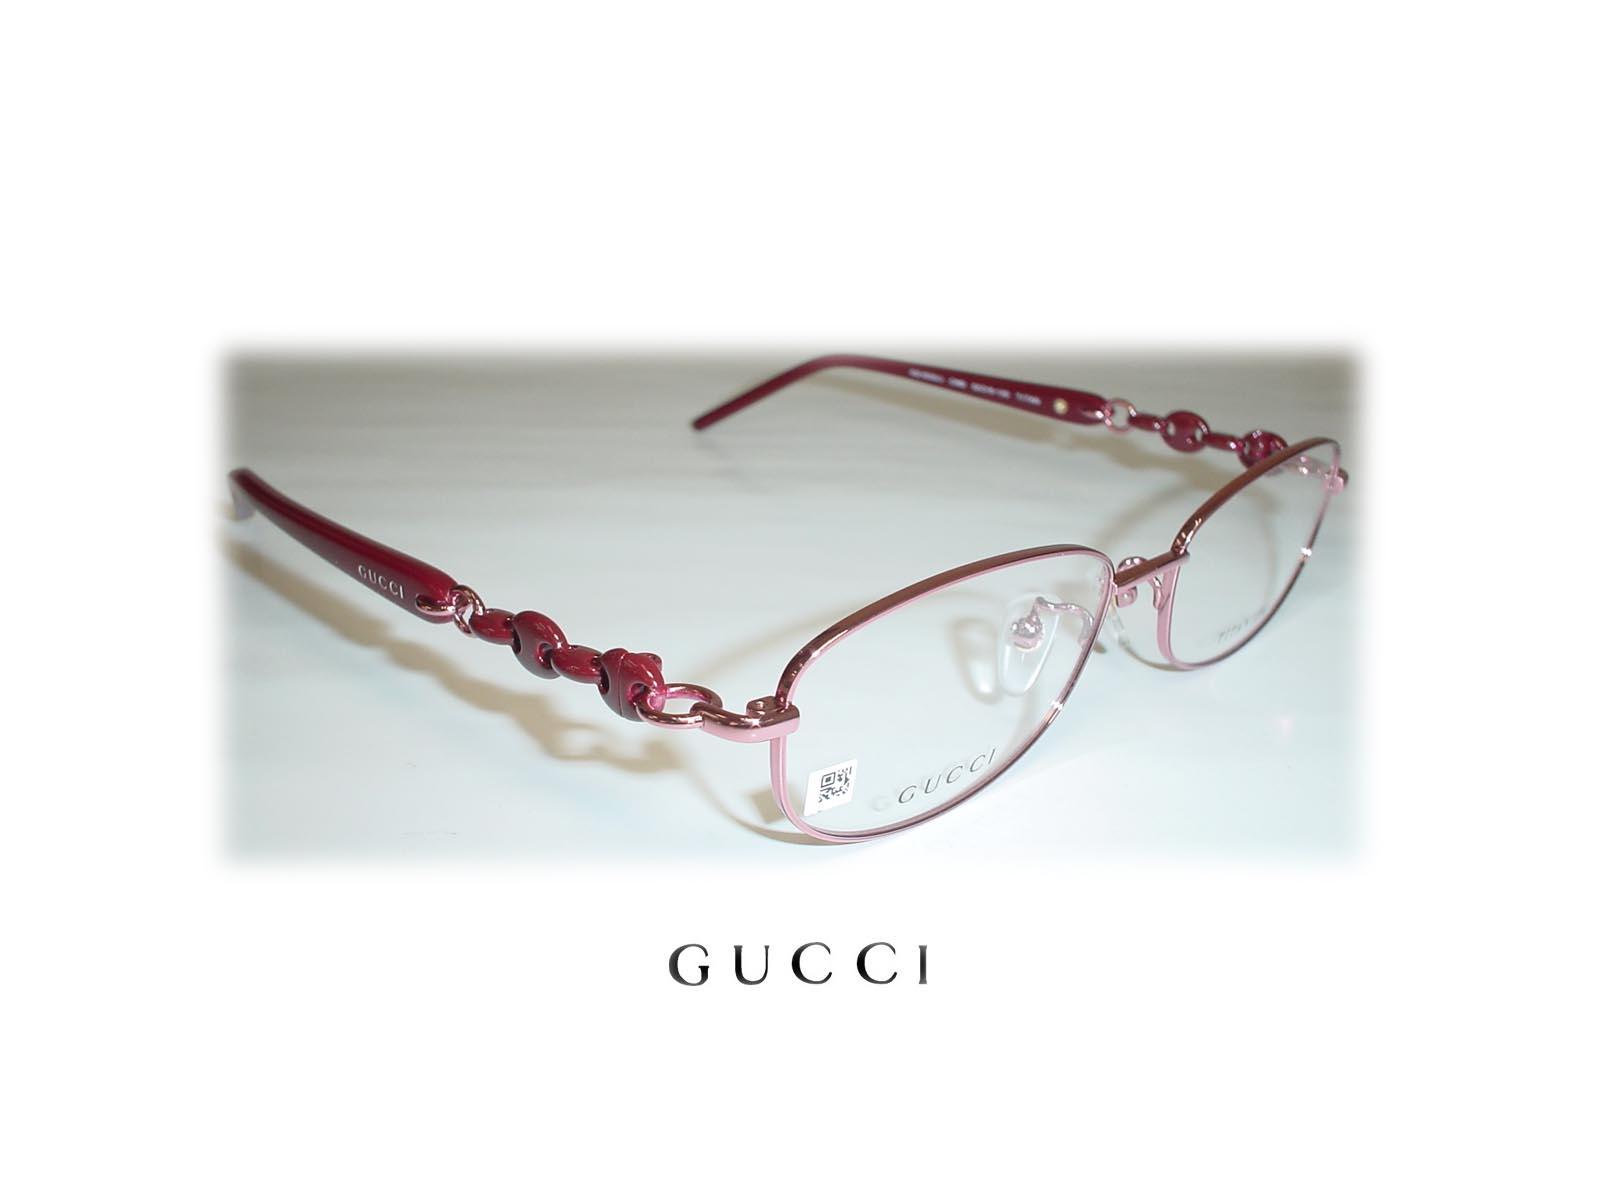 ★★GUCCI★★グッチ メガネ GG08556/J52□16-130 CWI ピンク超薄型非球面レンズ付